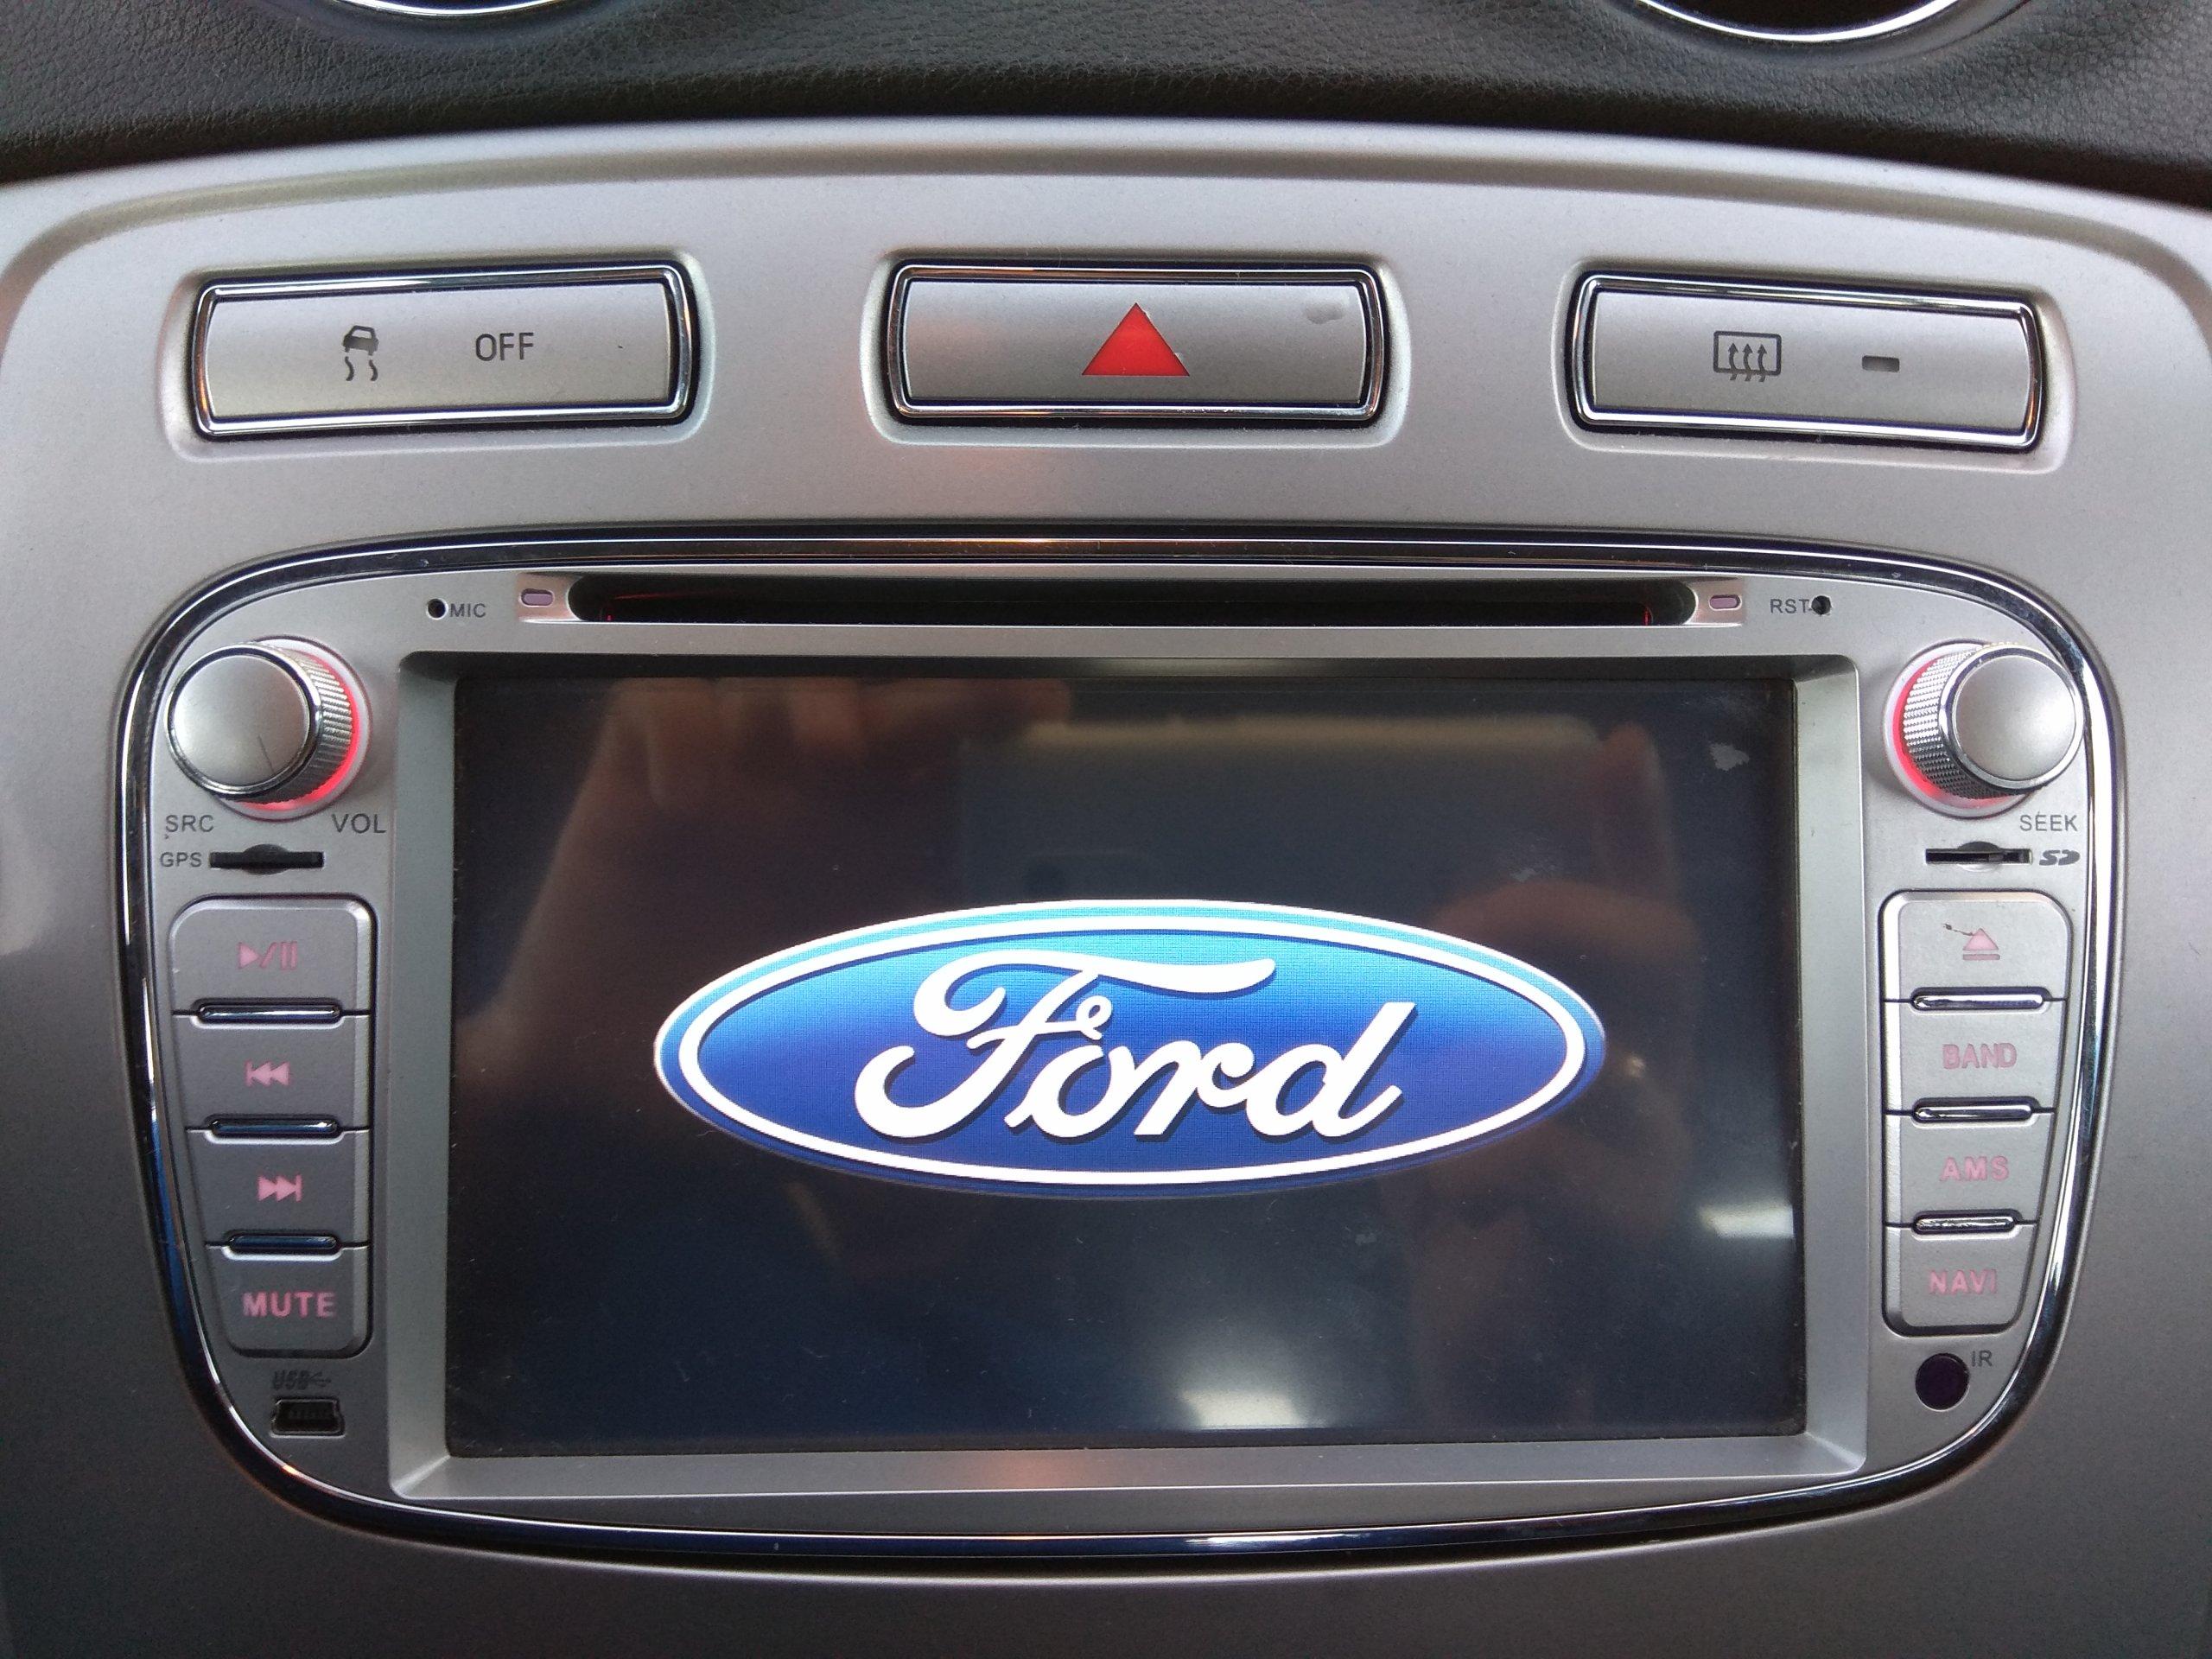 Zeer Radio GPS nawigacja Ford Mondeo Mk4 S-Max Galaxy - 7060586051  OF-99